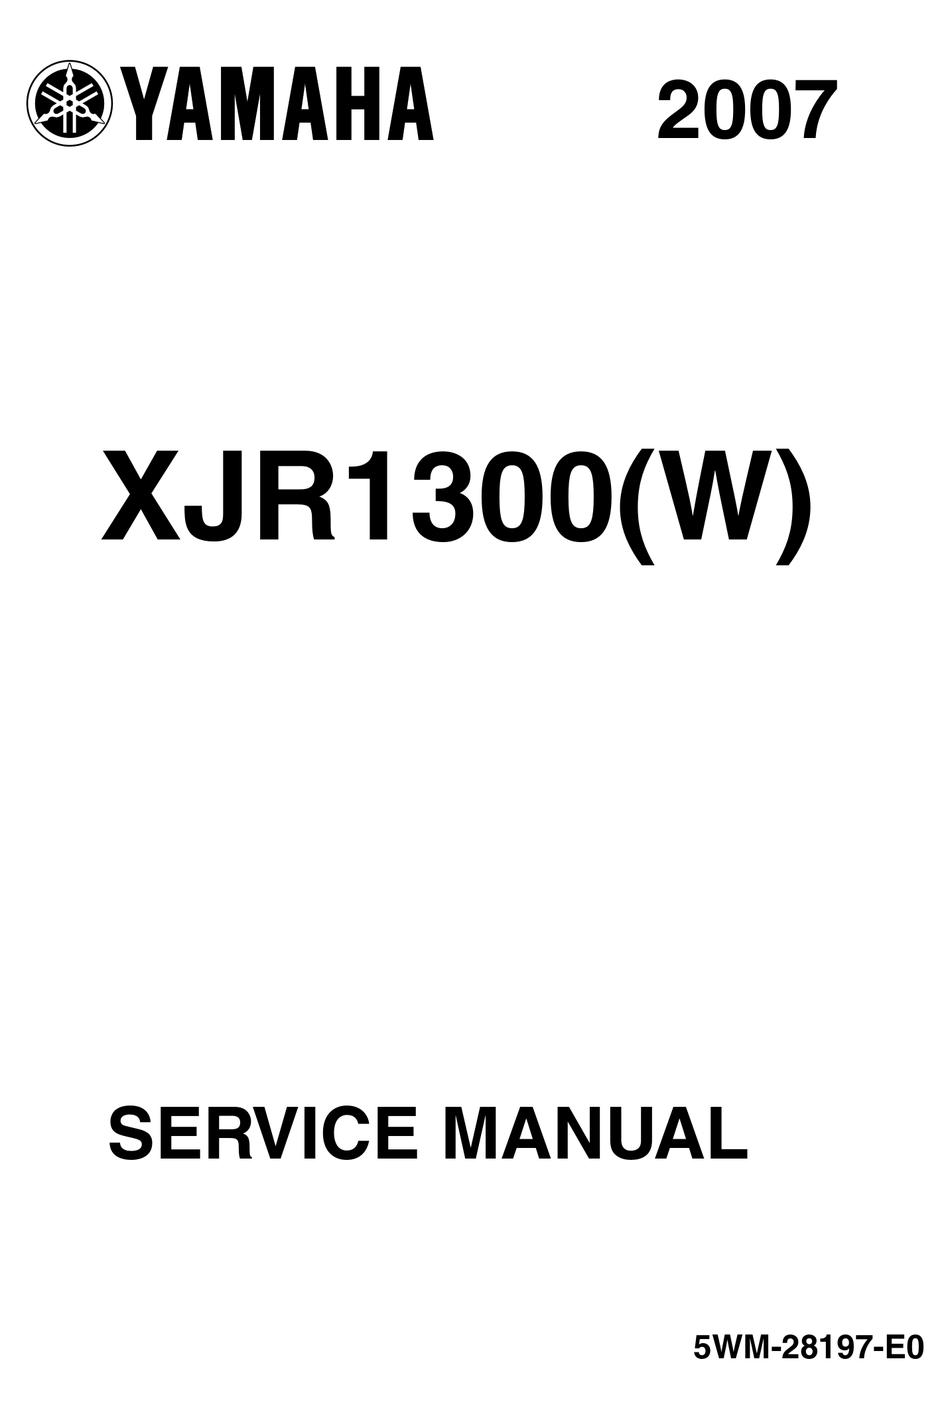 Yamaha Xjr 400 Manual Pdf / Honda Steed 400 Street Bikes